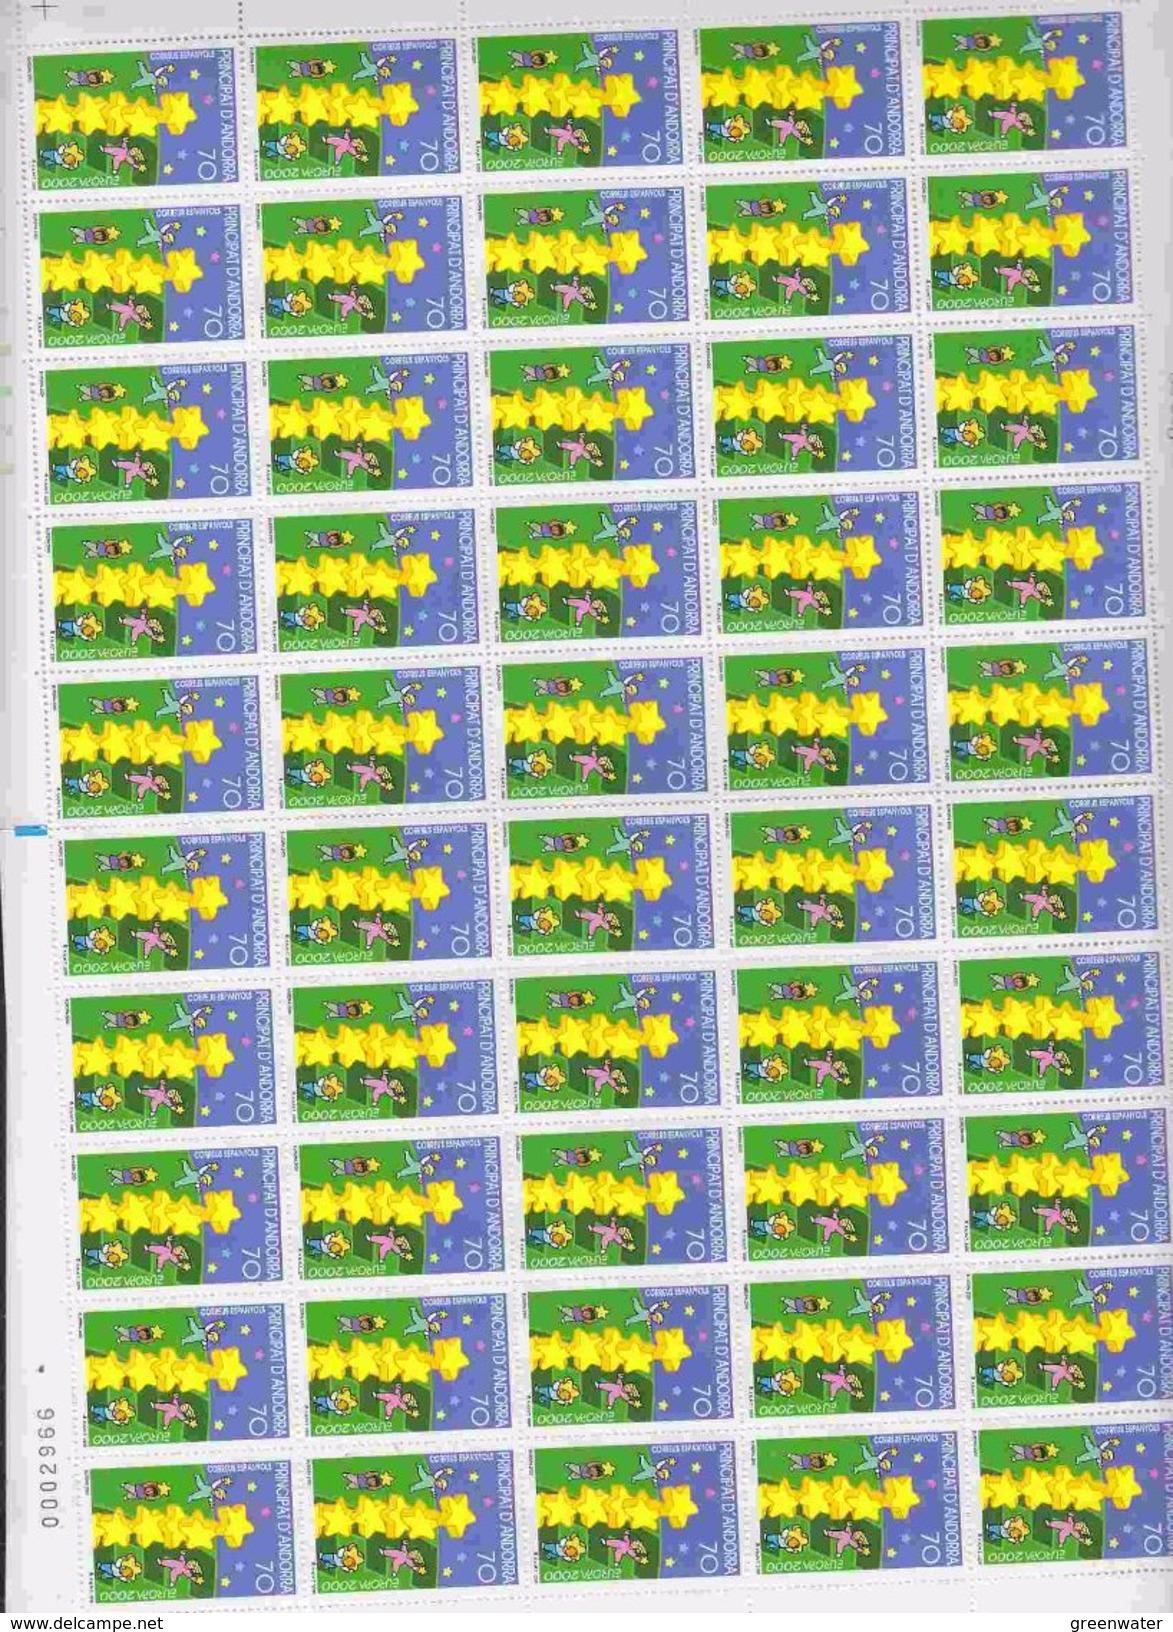 Europa Cept 2000 Andorra Sp 1v Sheetlet (shtlt Is 1x Folded) ** Mnh (F6727) - Europa-CEPT